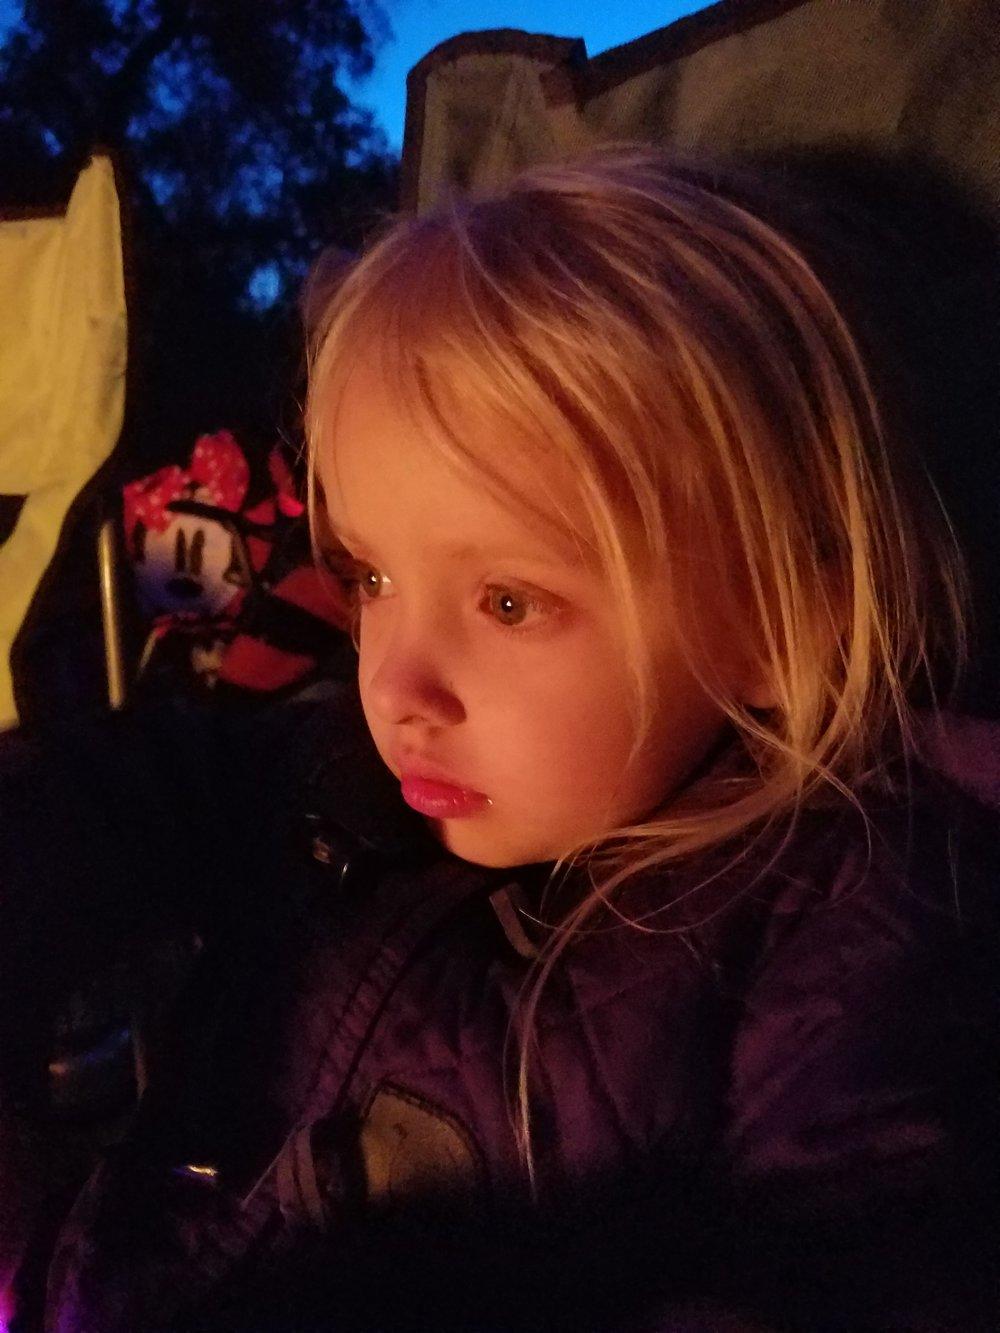 Campfire glow!